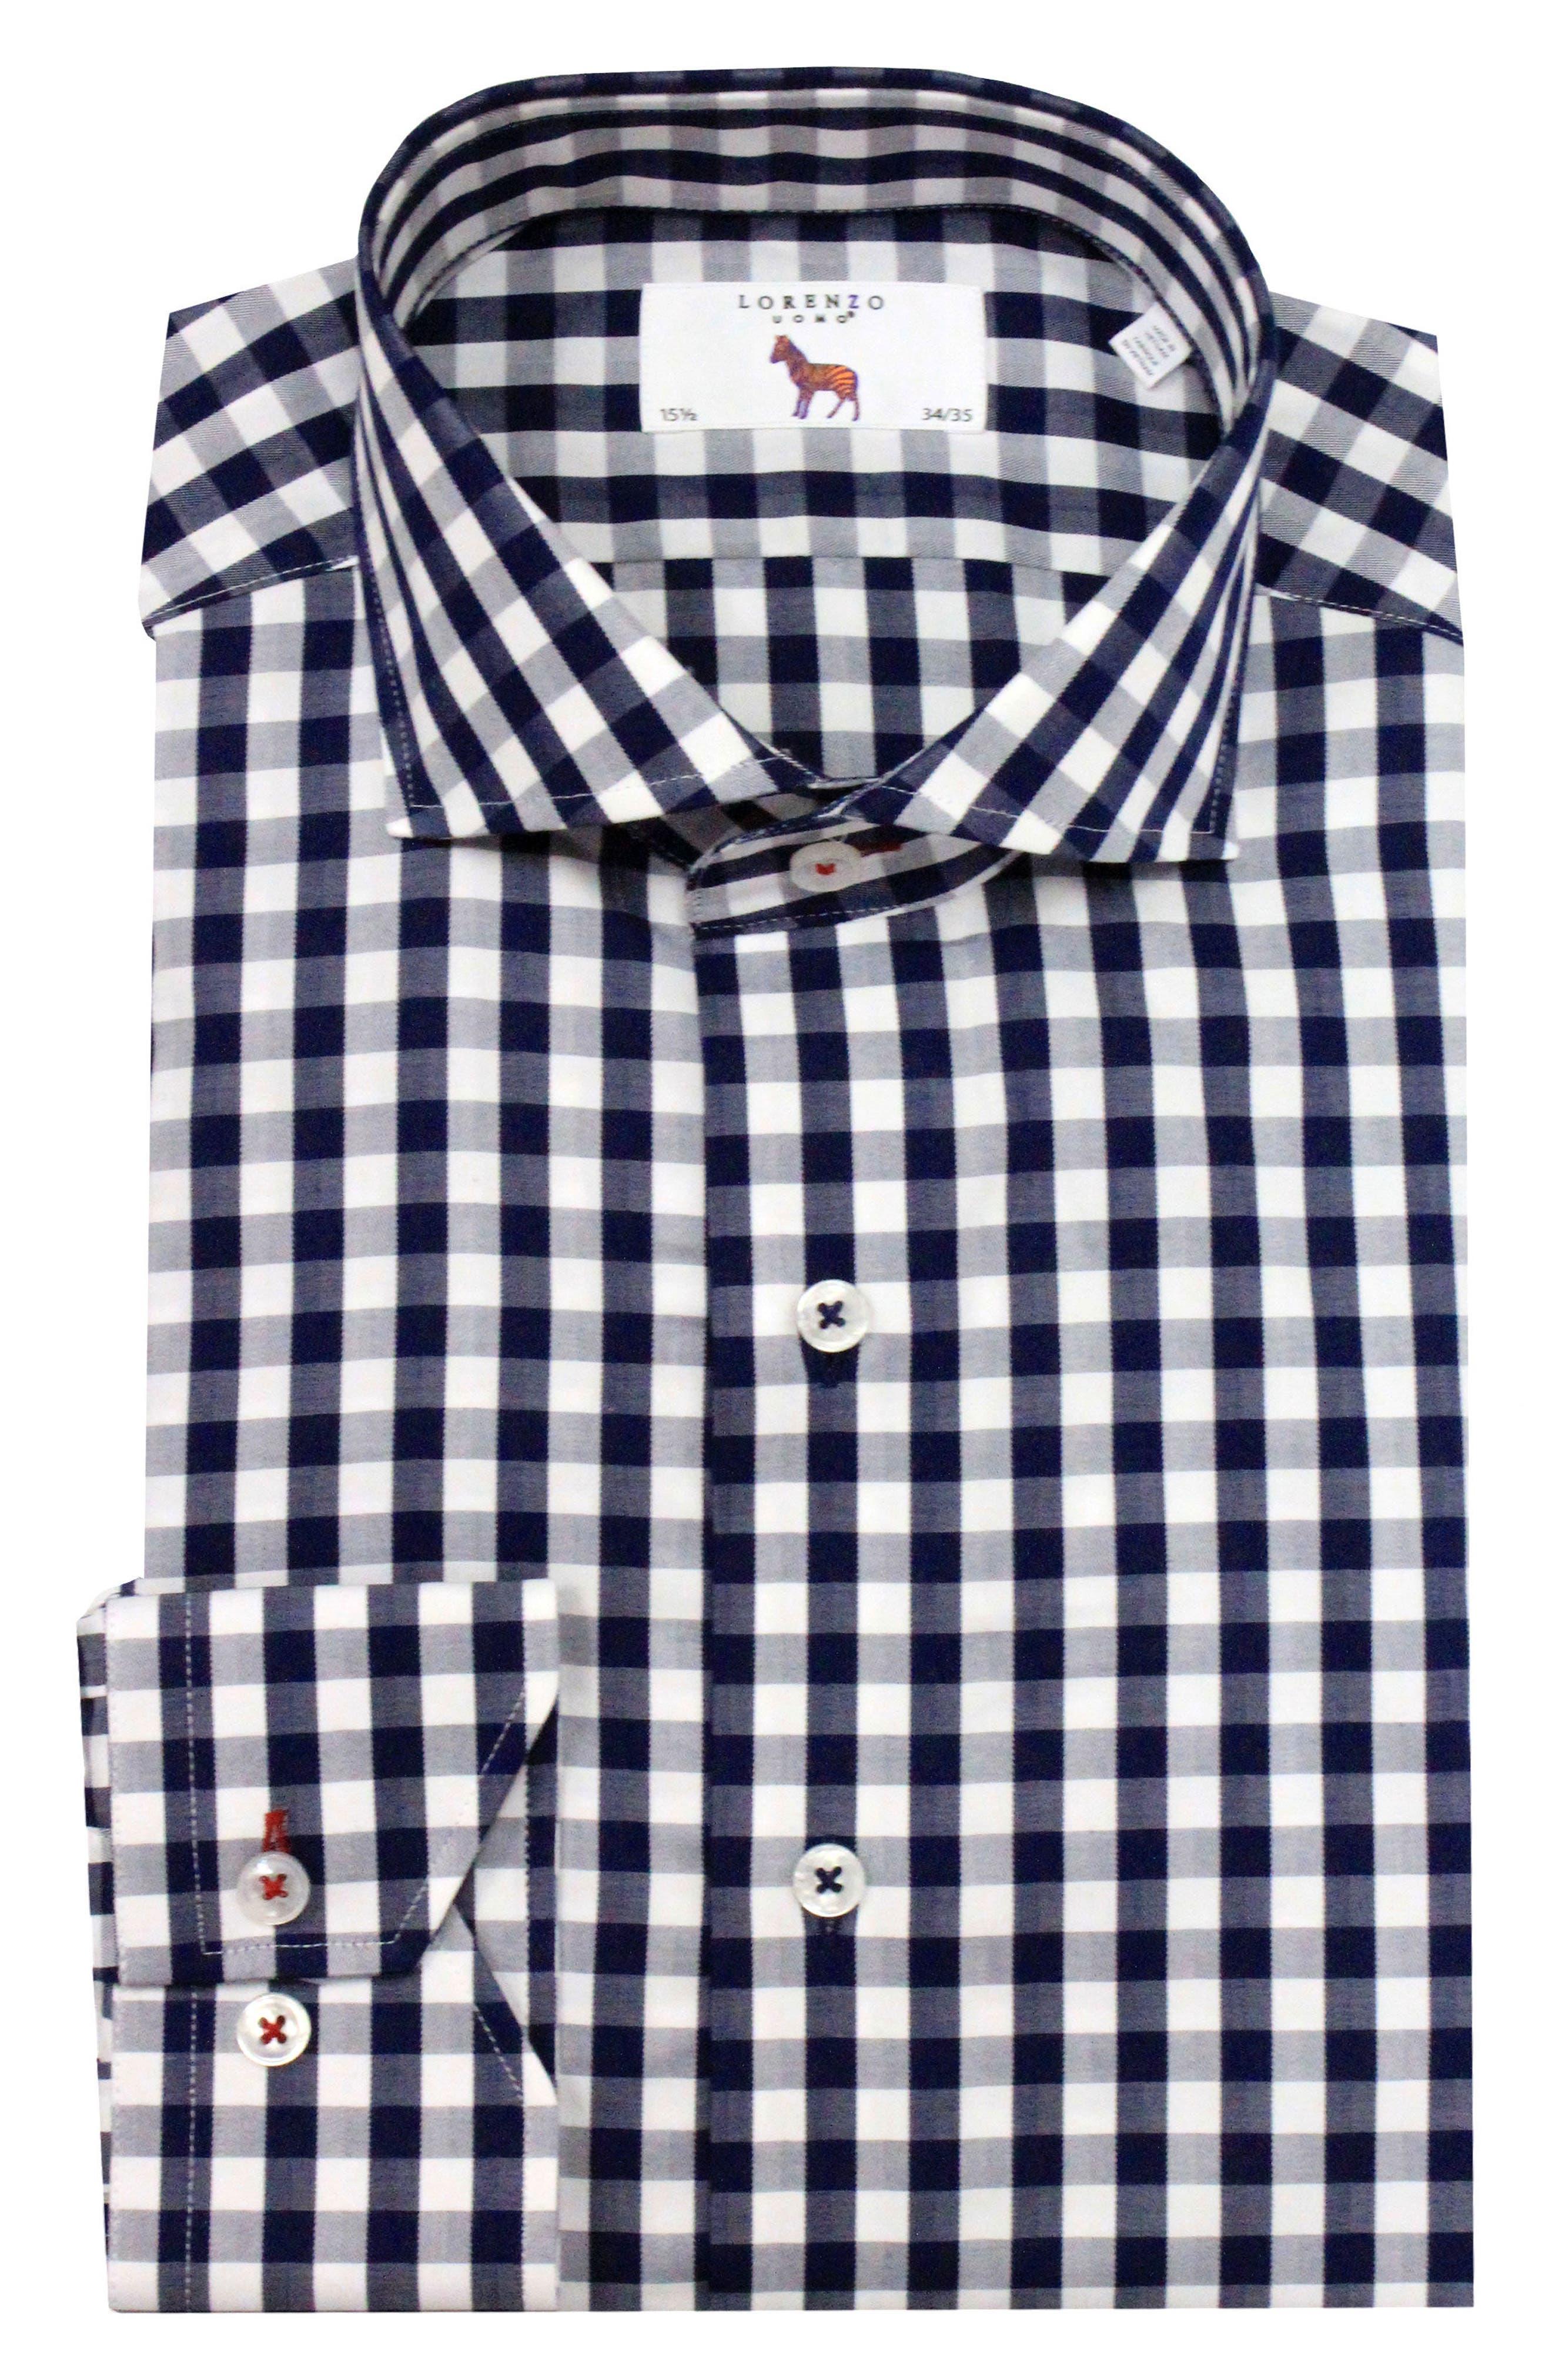 LORENZO UOMO, Trim Fit Gingham Dress Shirt, Main thumbnail 1, color, NAVY